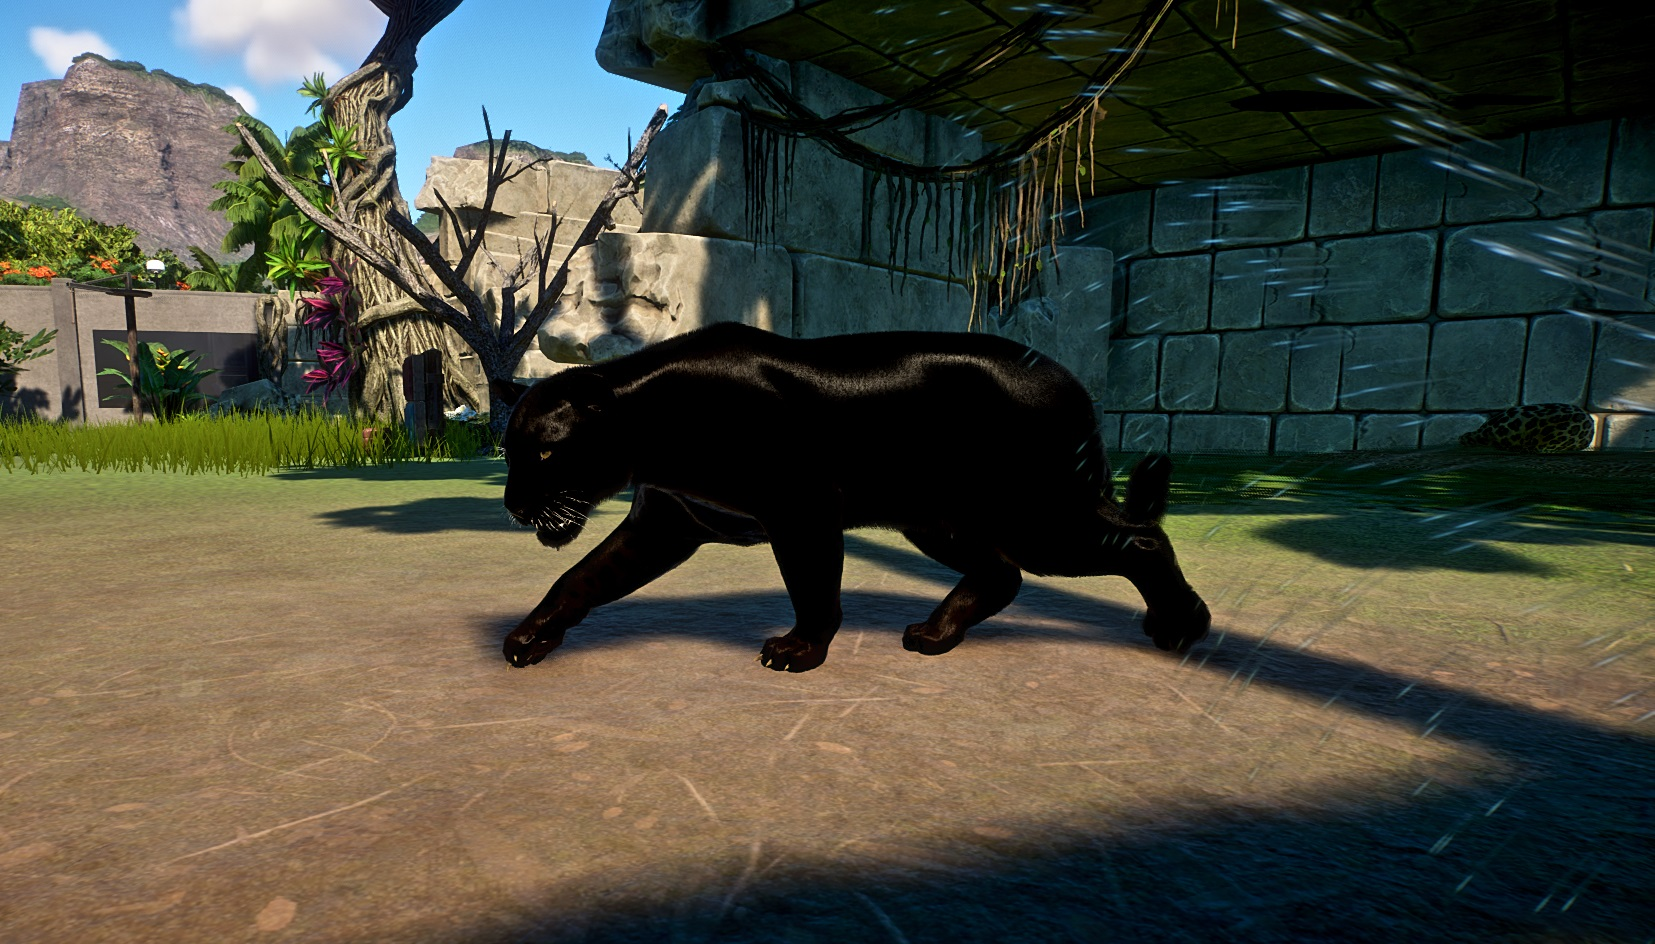 Planet Zoo Screenshot 2020.11.01 - 15.37.20.39 (2).jpg